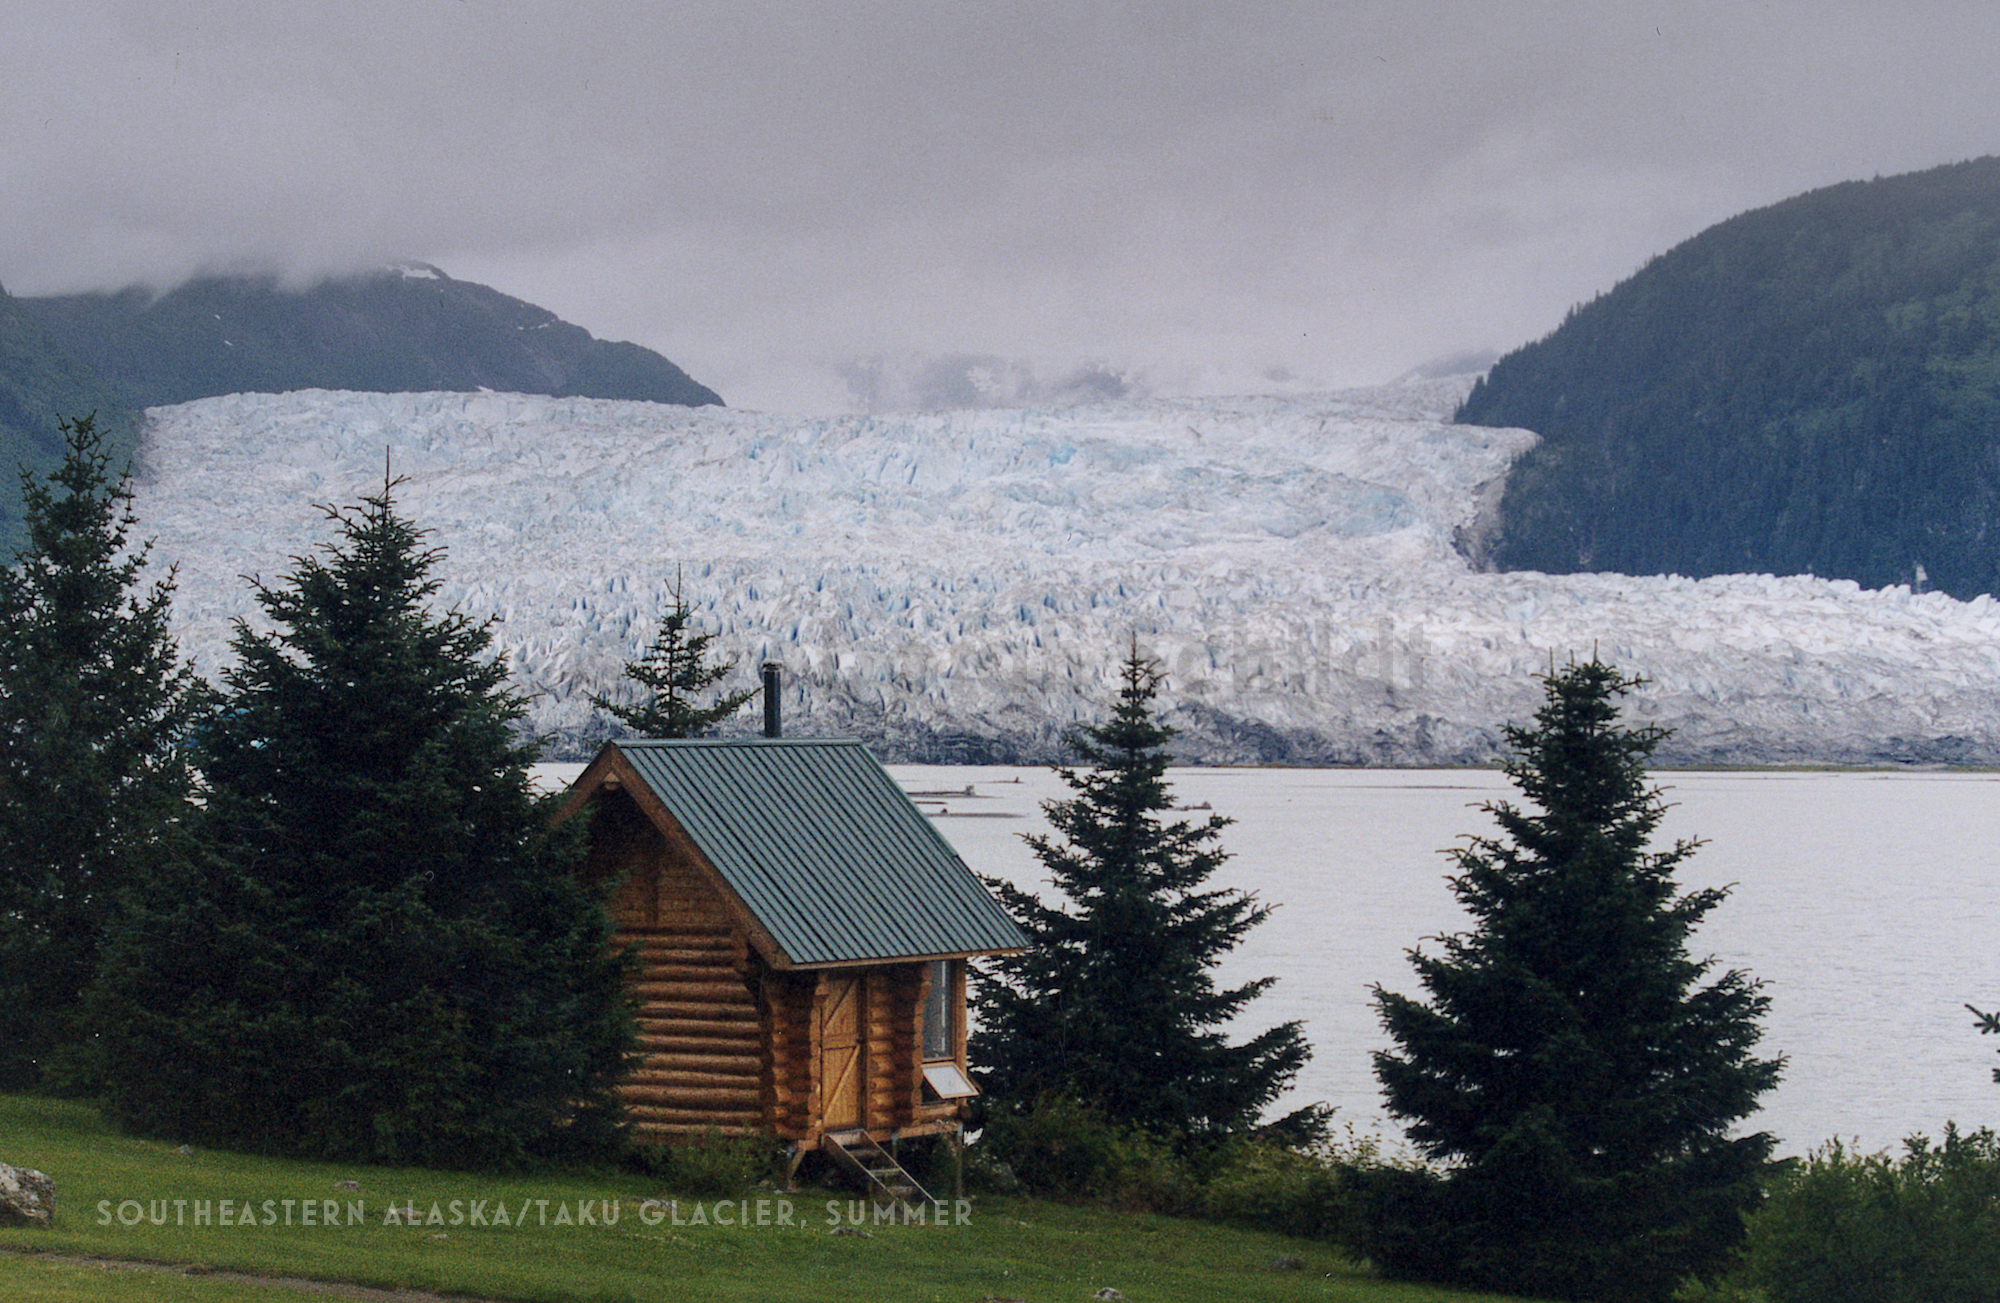 CT5 South Eastern Alaska-Taku Glacier summer.jpg